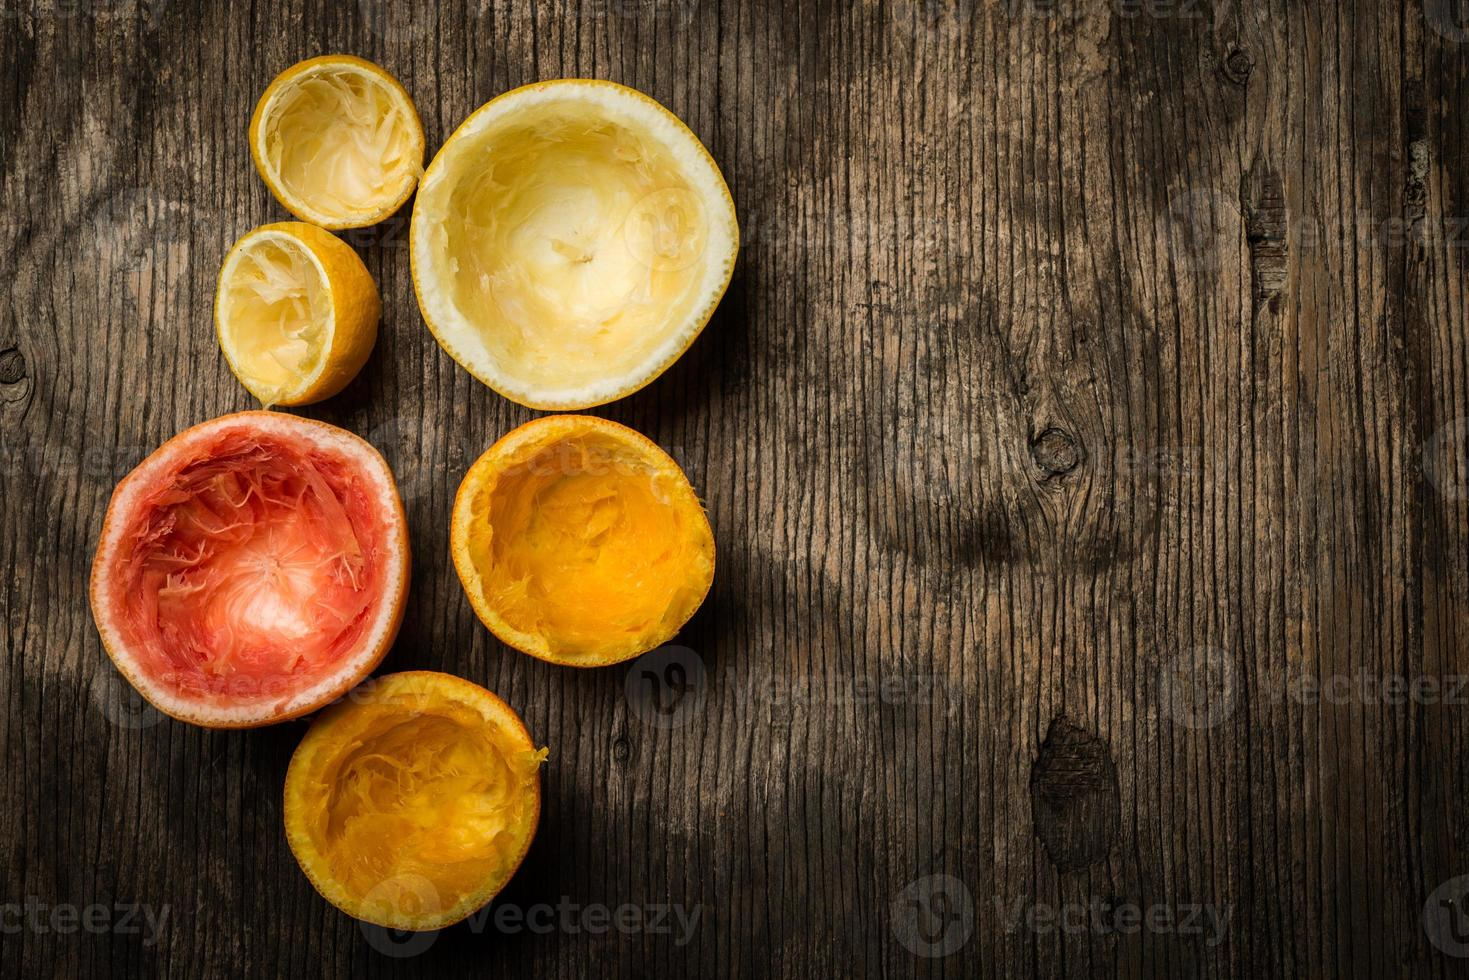 citrinos espremidos, vista superior foto